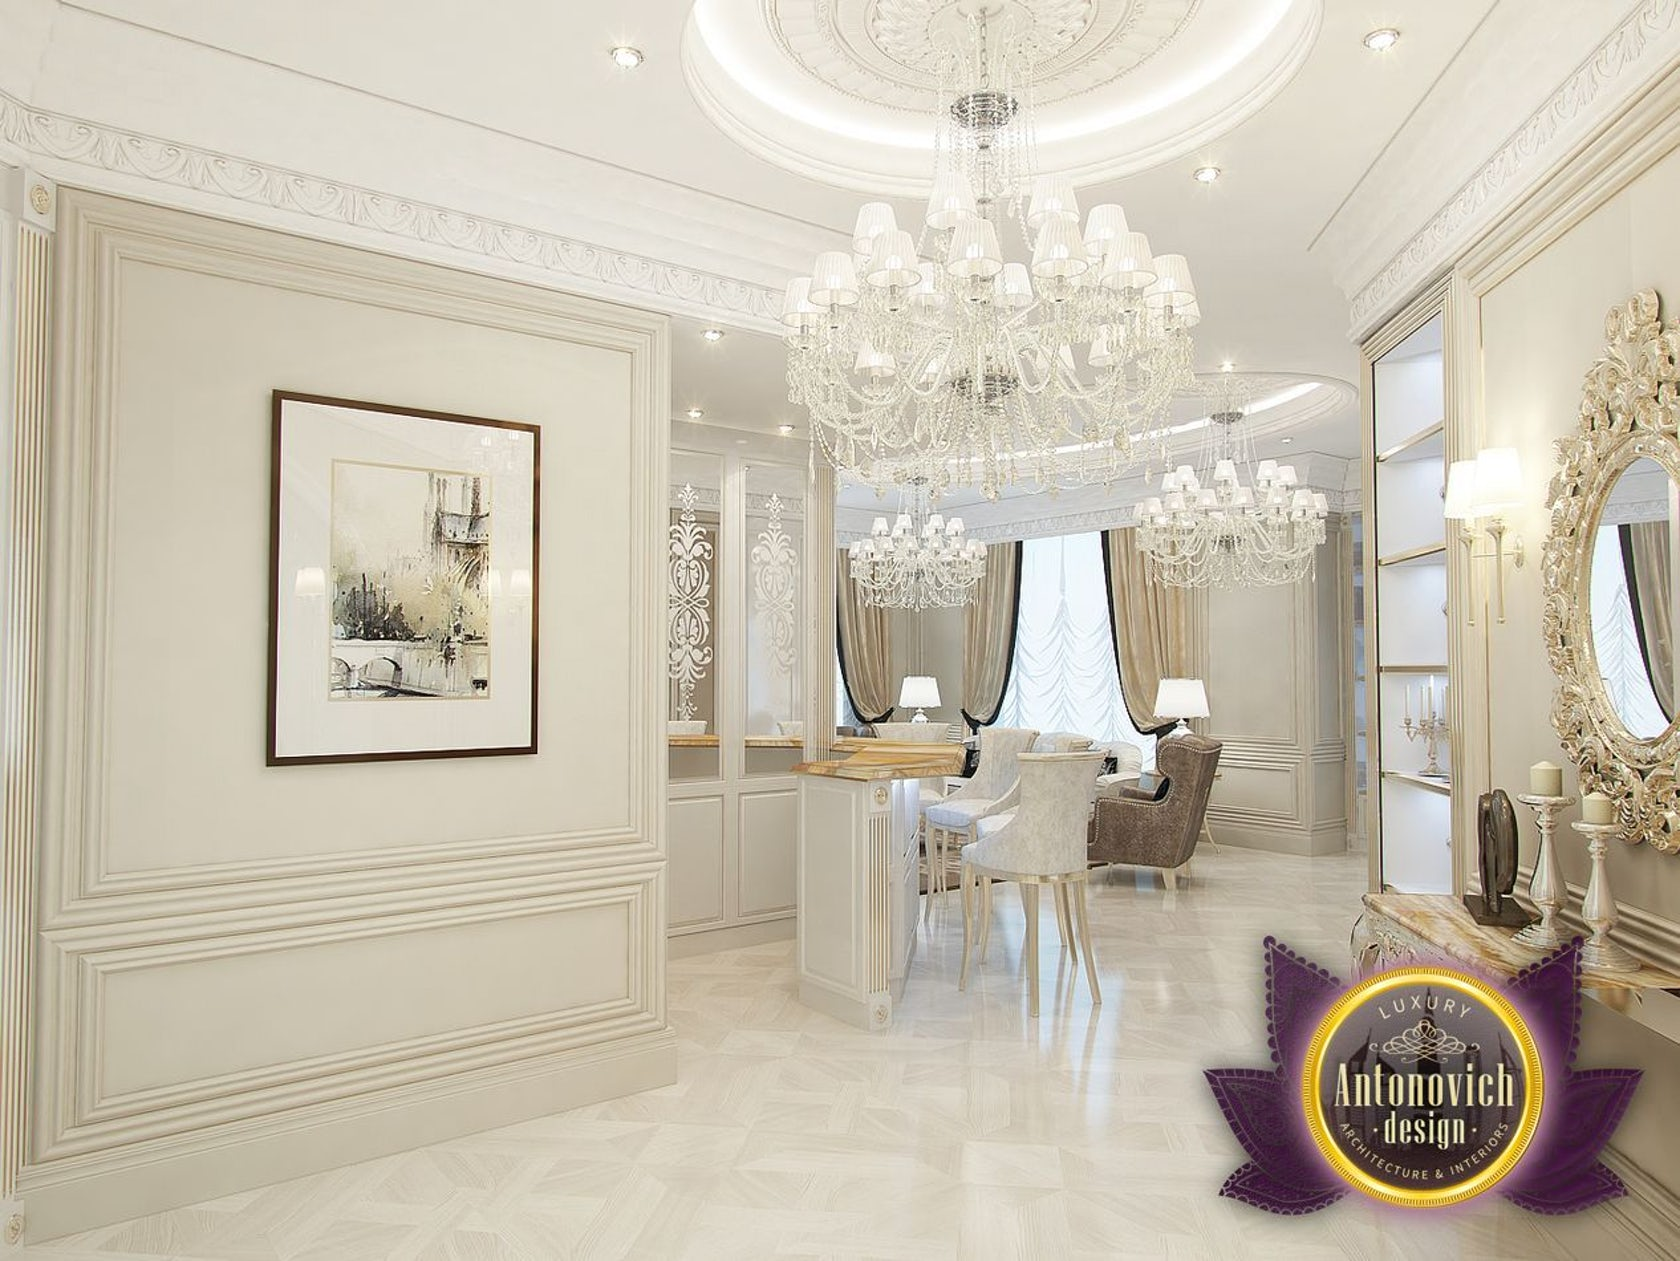 The entrance design by luxury antonovich design on architizer